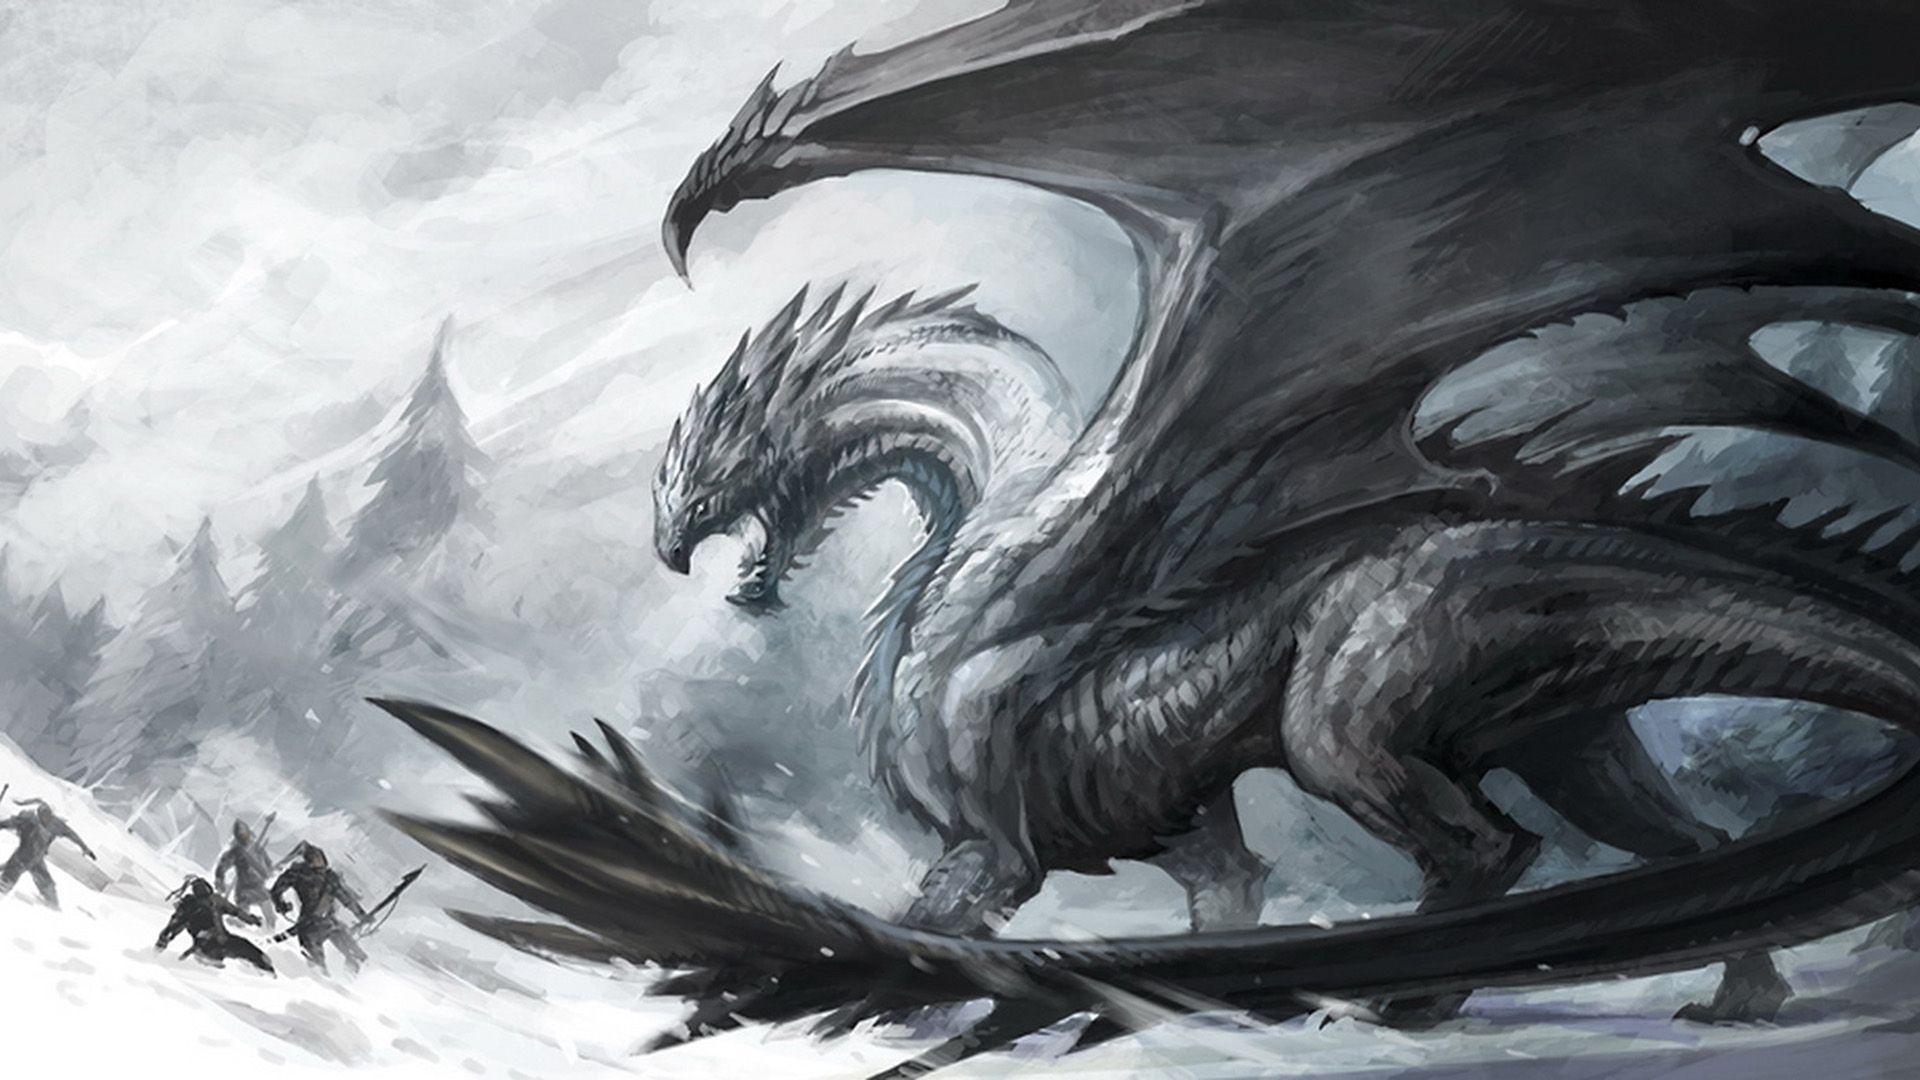 Wallpapers For > Fantasy White Dragon Wallpaper